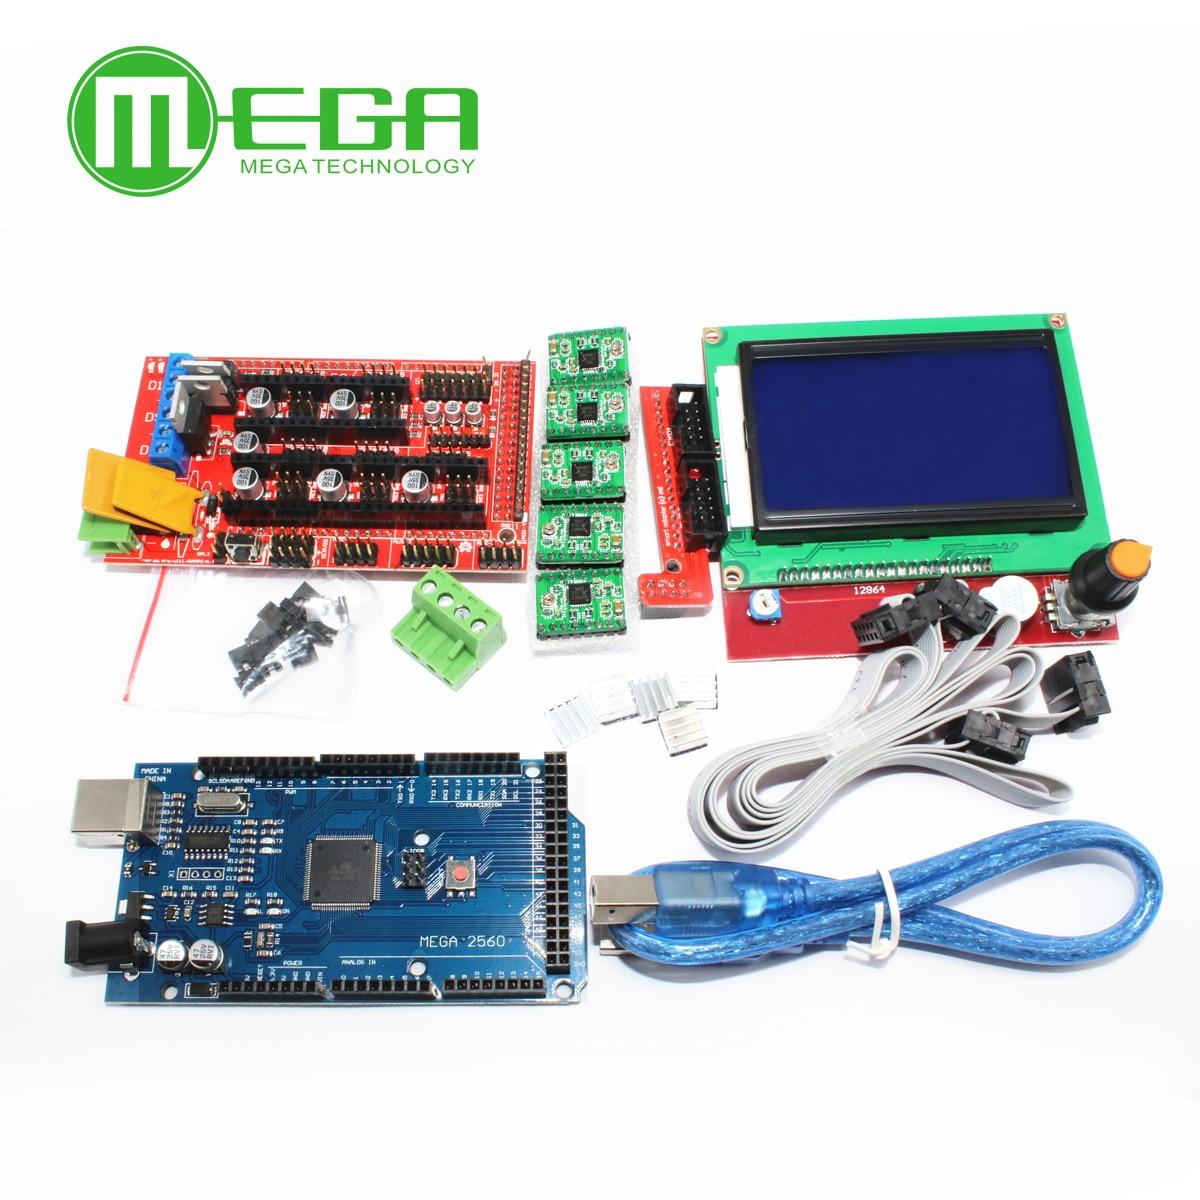 1 pz Mega 2560 R3 CH340 + 1 pz RAMPE 1.4 Controller + 5 pz A4988 Passo Passo del Driver del Modulo + 1 pz 12864 controller per 3D kit Stampante